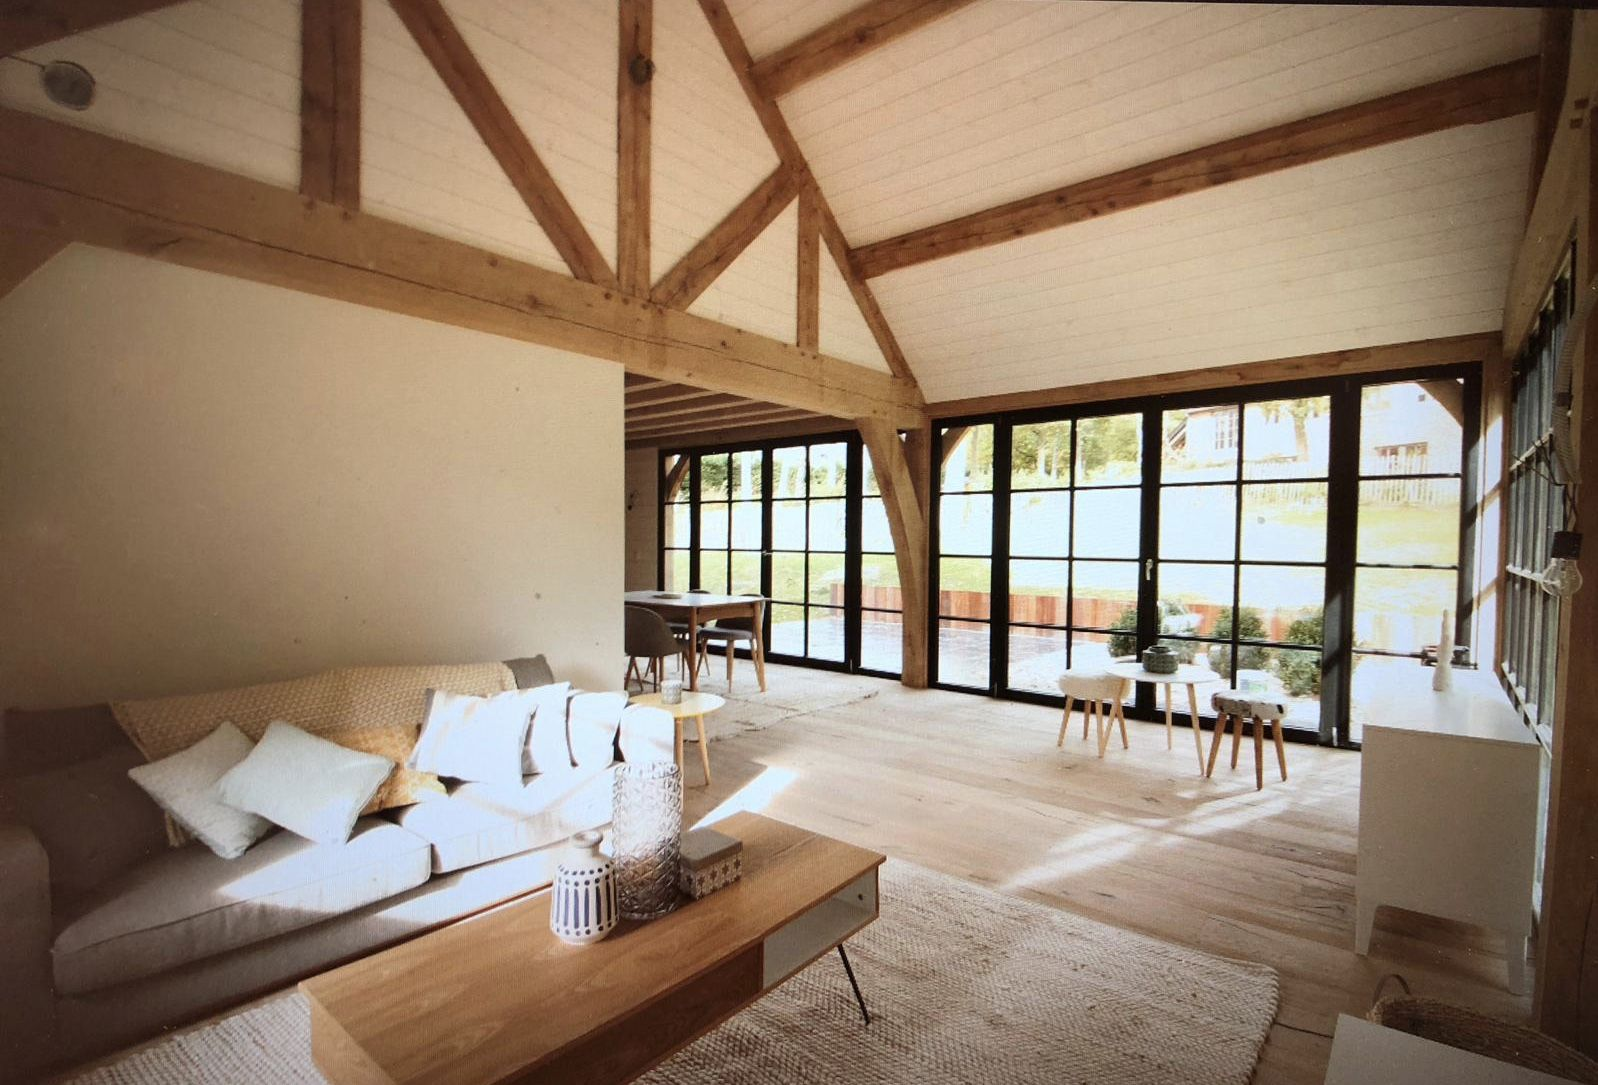 Maison Structure Chene Oakframe Oak Belgium Oakframedhouse Charminghouse Beams Emac Invest